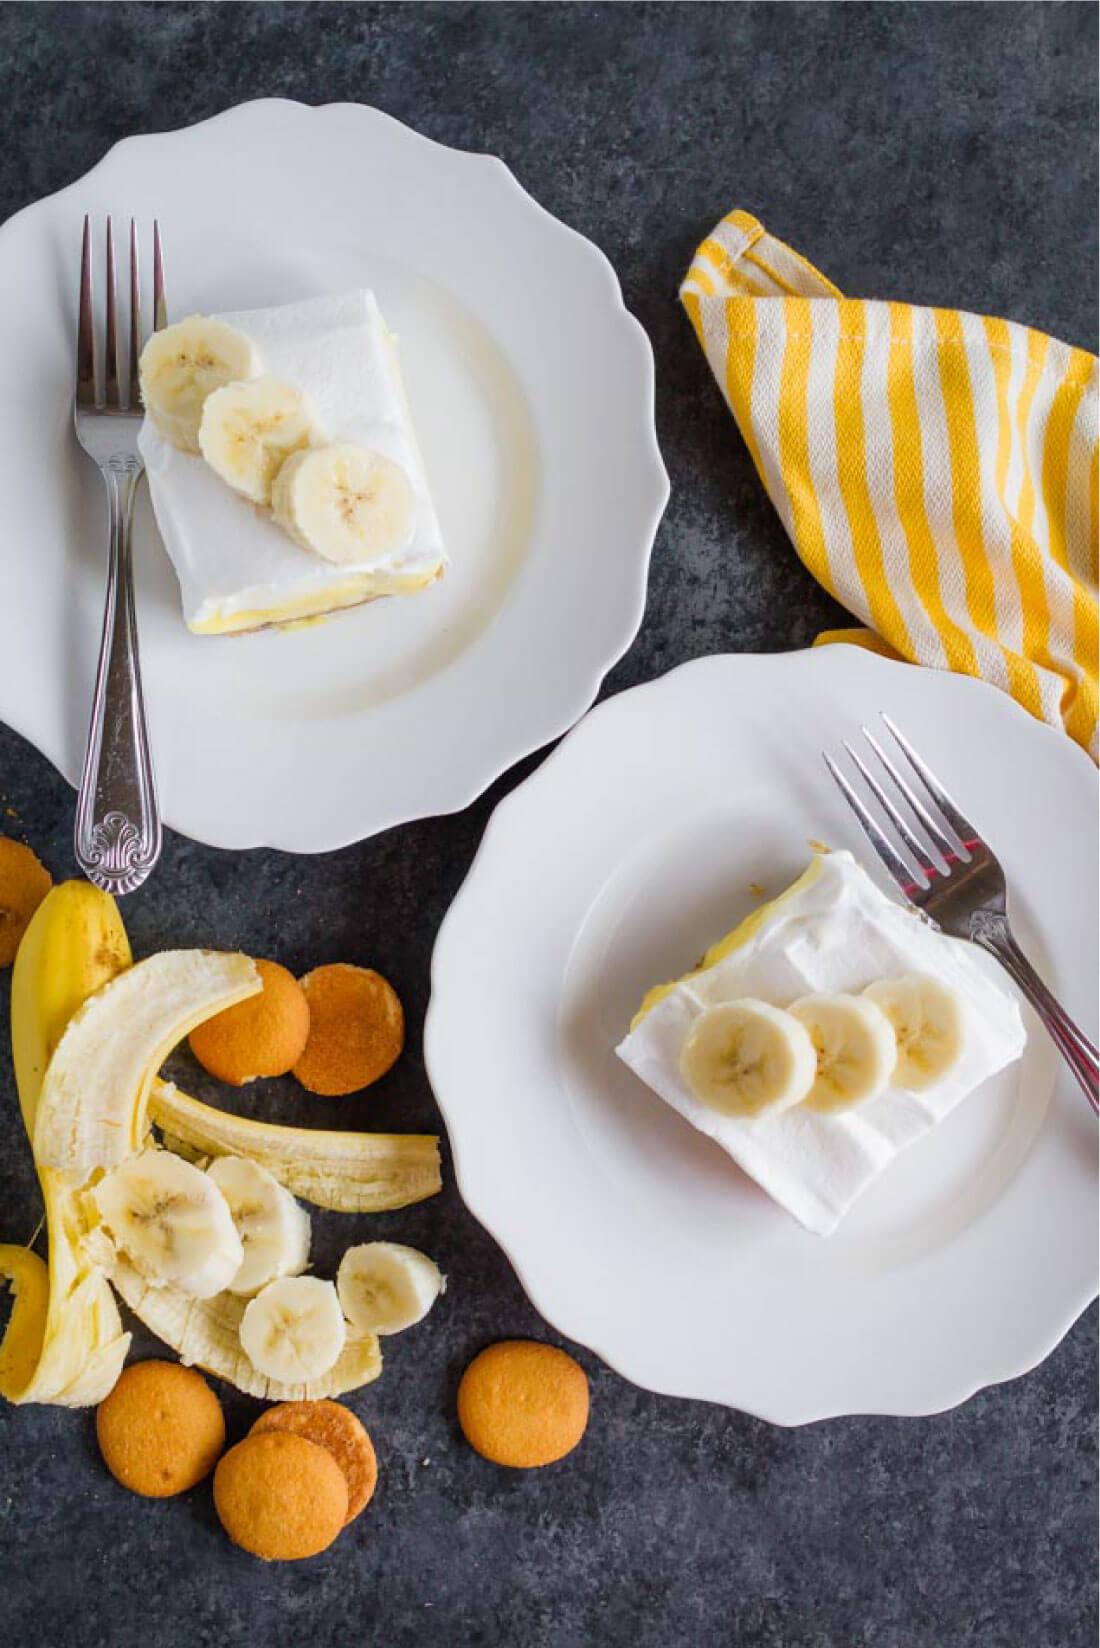 The most delicious Triple Layer Banana Cream Pie Bars - a good, easy dessert recipe from thirtyhandmadedays.com